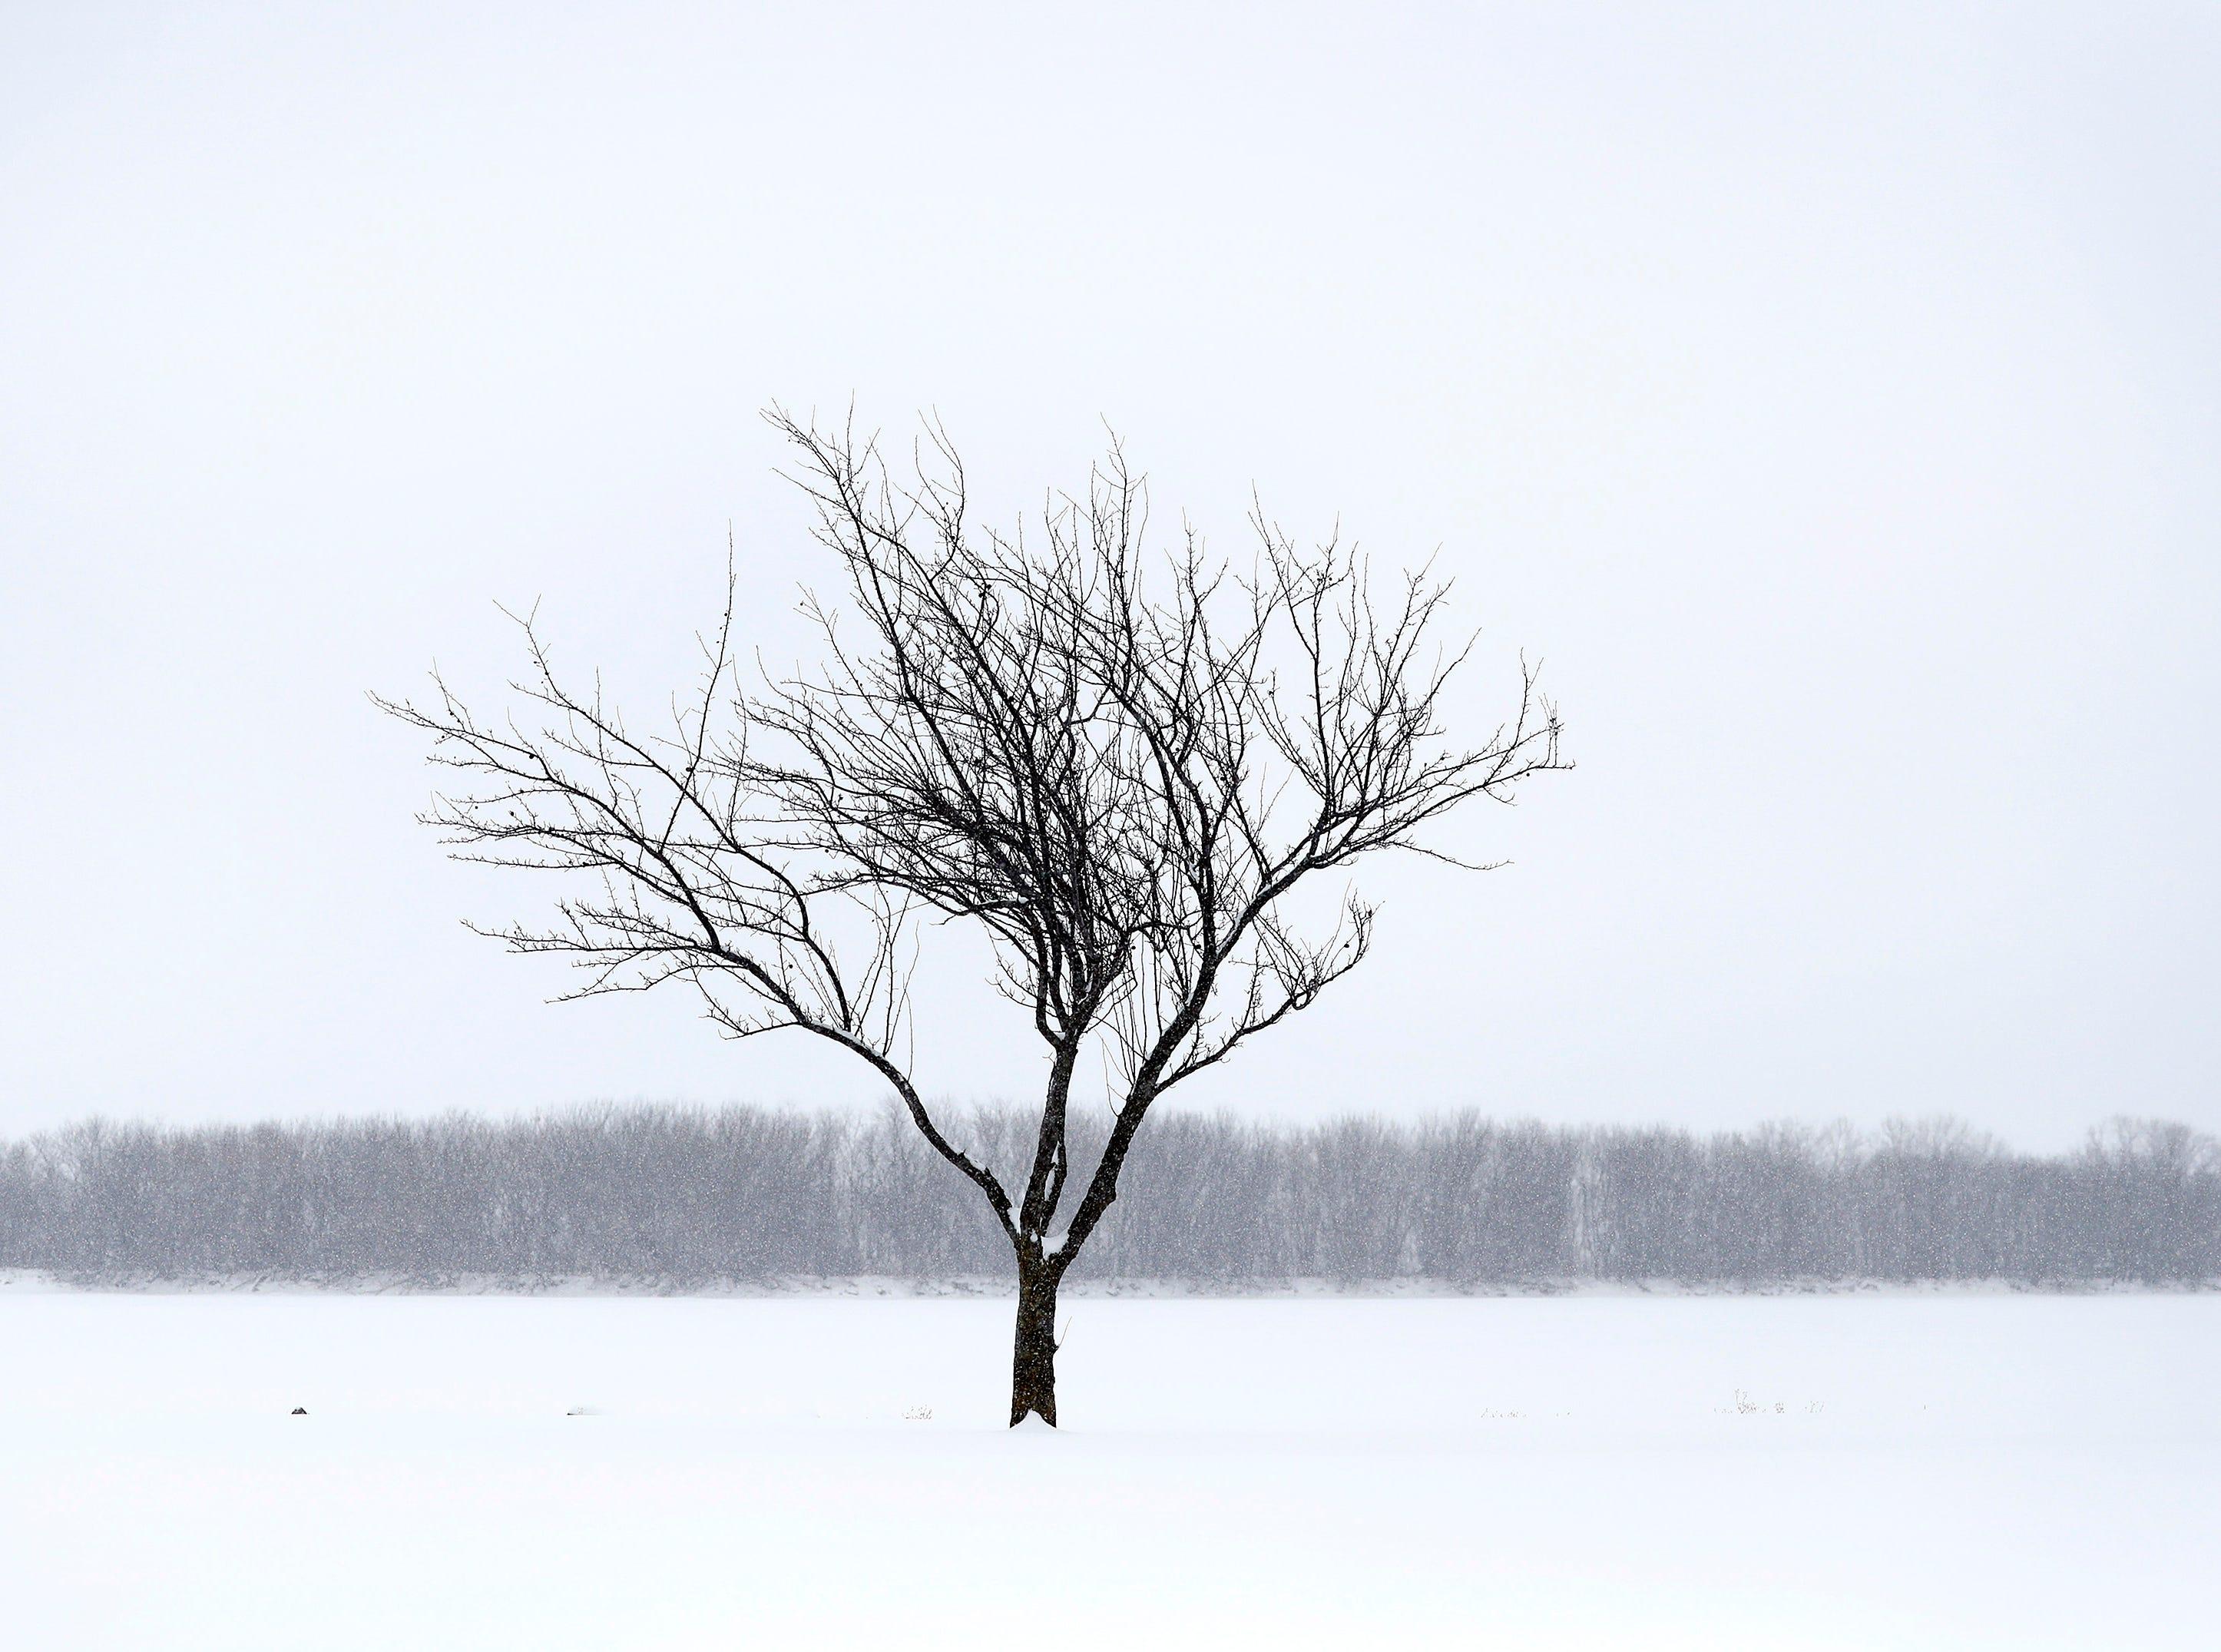 Snow falls on Menominee Park Wednesday, Jan. 23, 2019, in Oshkosh, Wis.Danny Damiani/USA TODAY NETWORK-Wisconsin